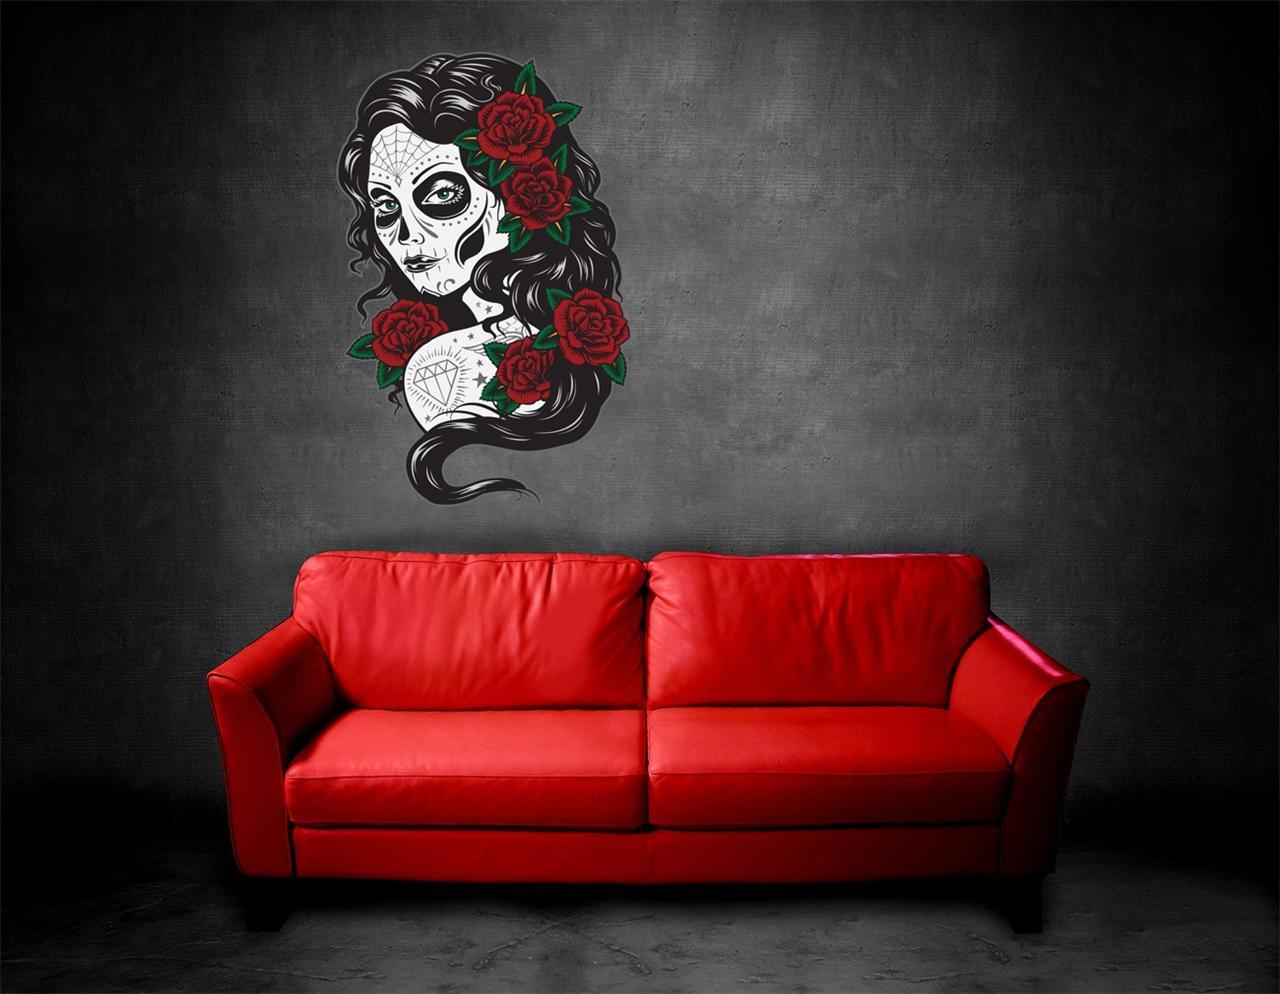 Http Ebay Com Itm Wall Art Sticker Decal Tattoo Day Of The Dead Sugar Skull Woman Halloween 120998201574